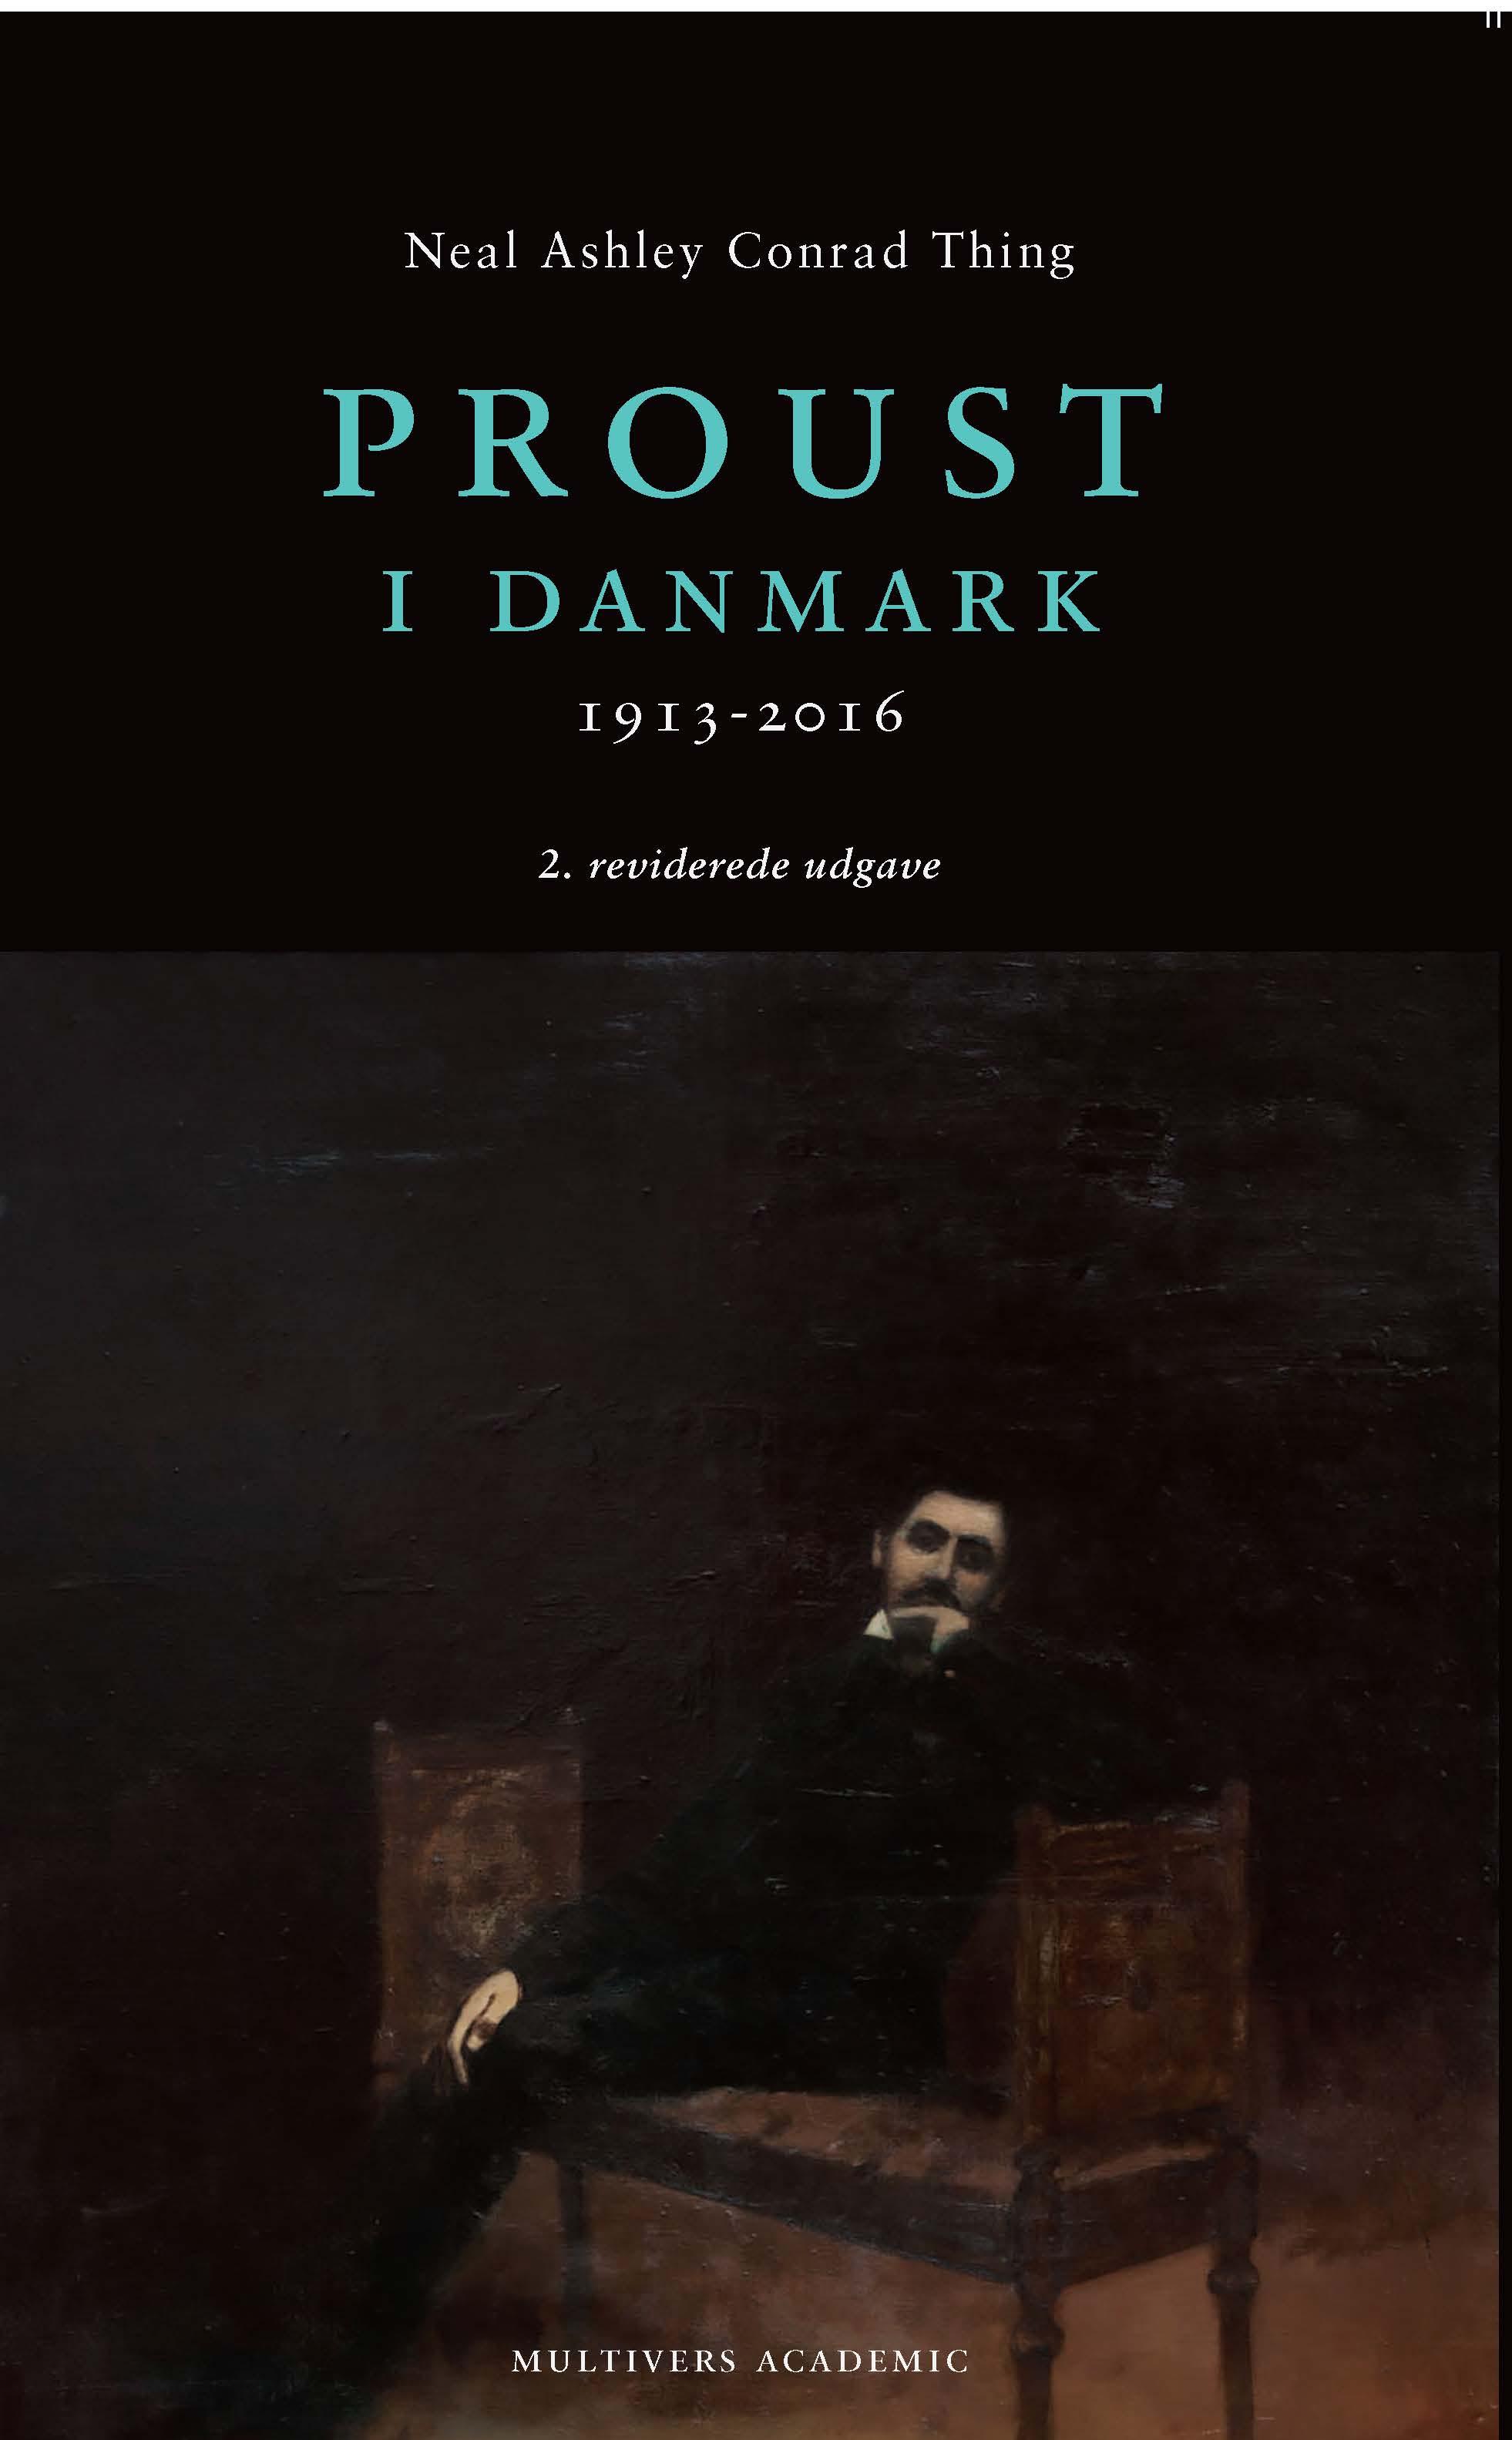 Proust i Danmark